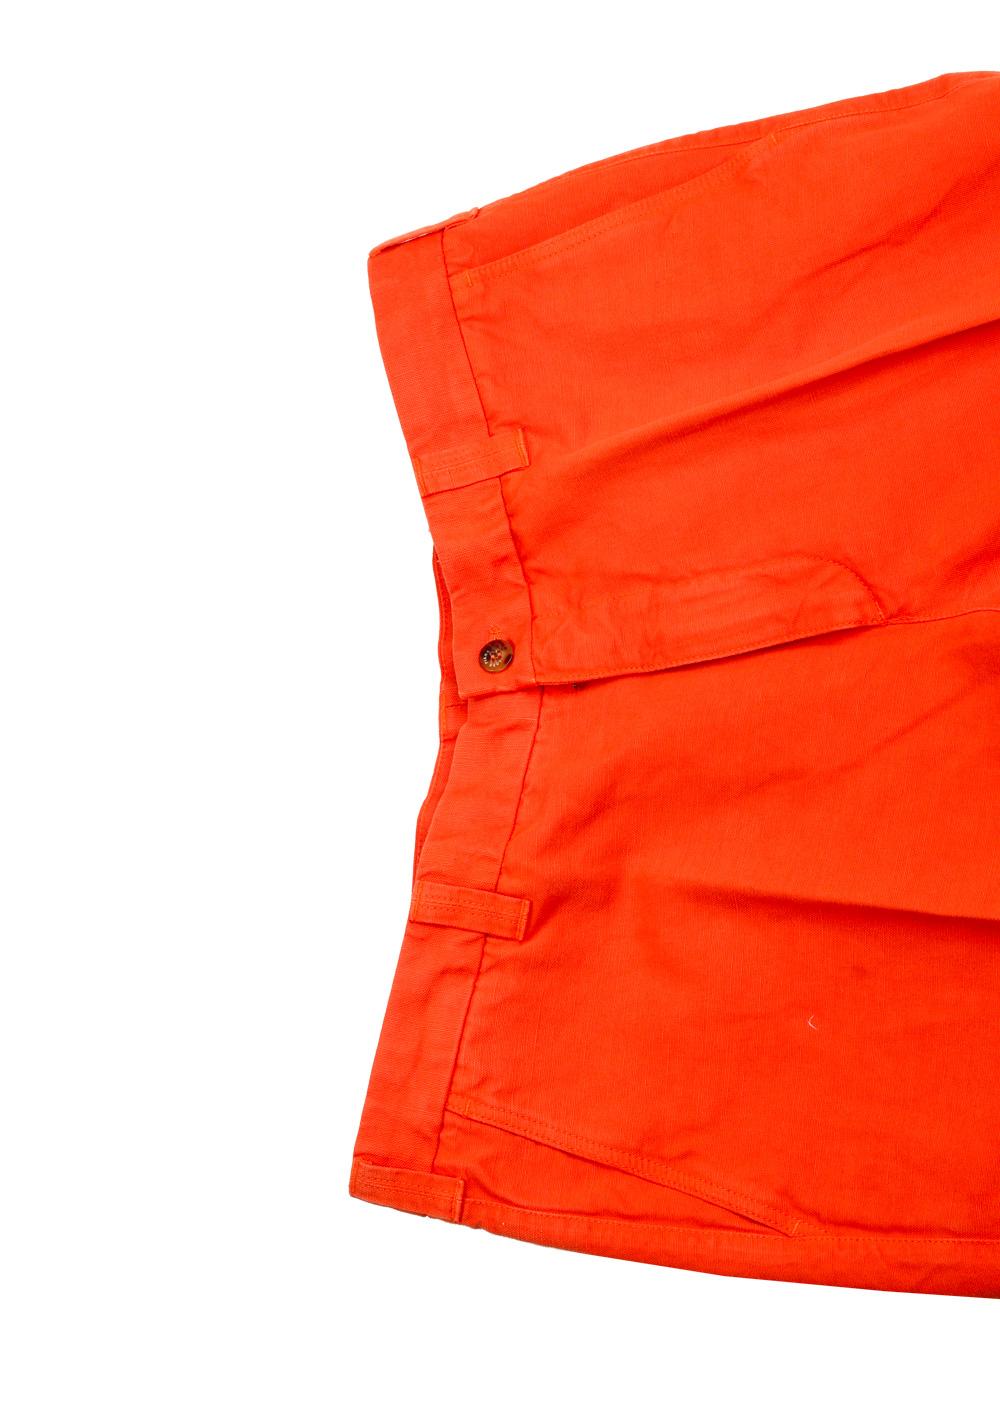 Loro Piana Orange Trousers Size 56 / 40 U.S.   Costume Limité